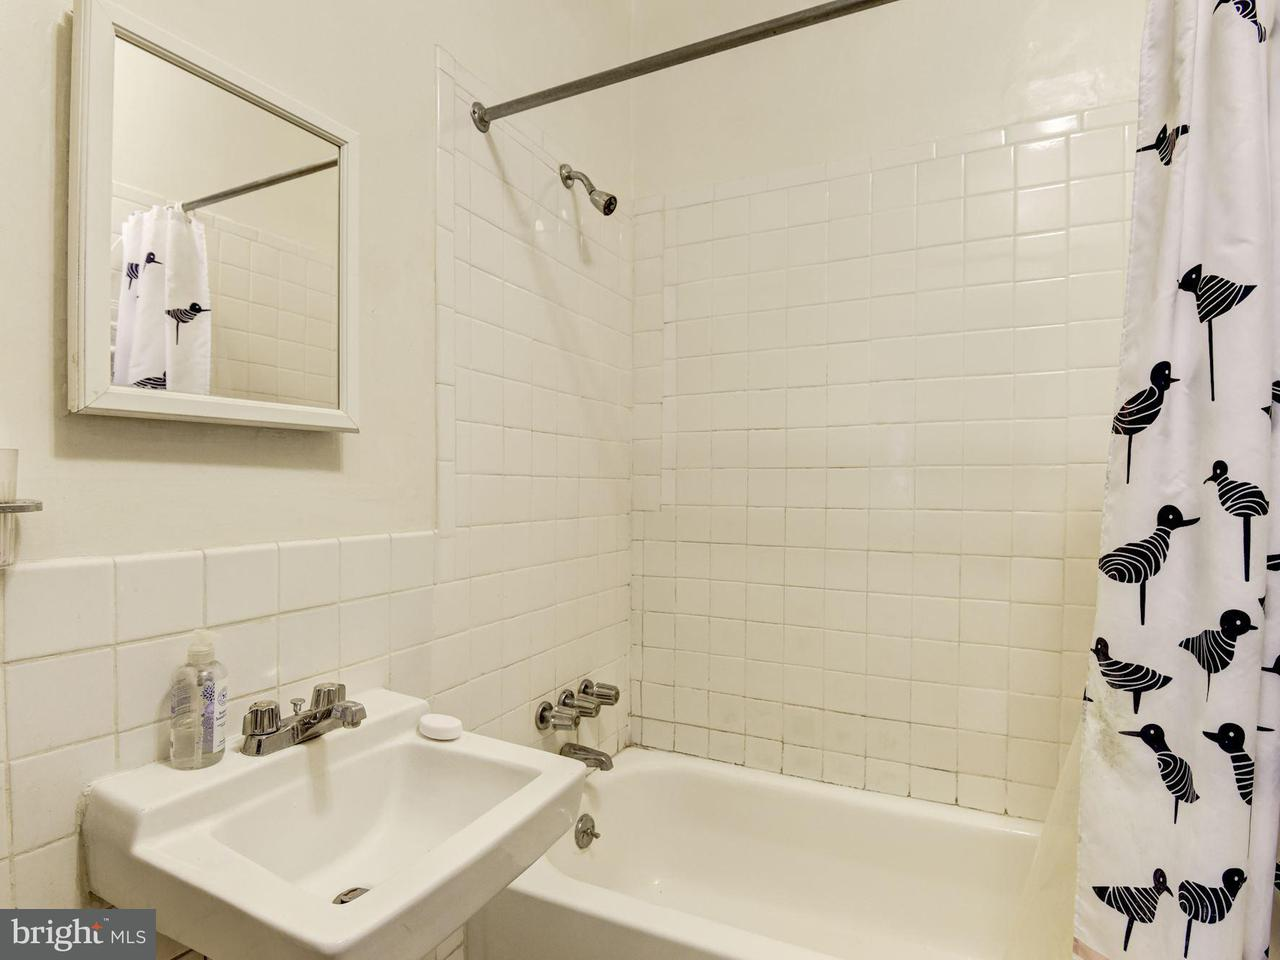 Additional photo for property listing at 2305 17th St Nw 2305 17th St Nw Washington, Περιφερεια Τησ Κολουμπια 20009 Ηνωμενεσ Πολιτειεσ